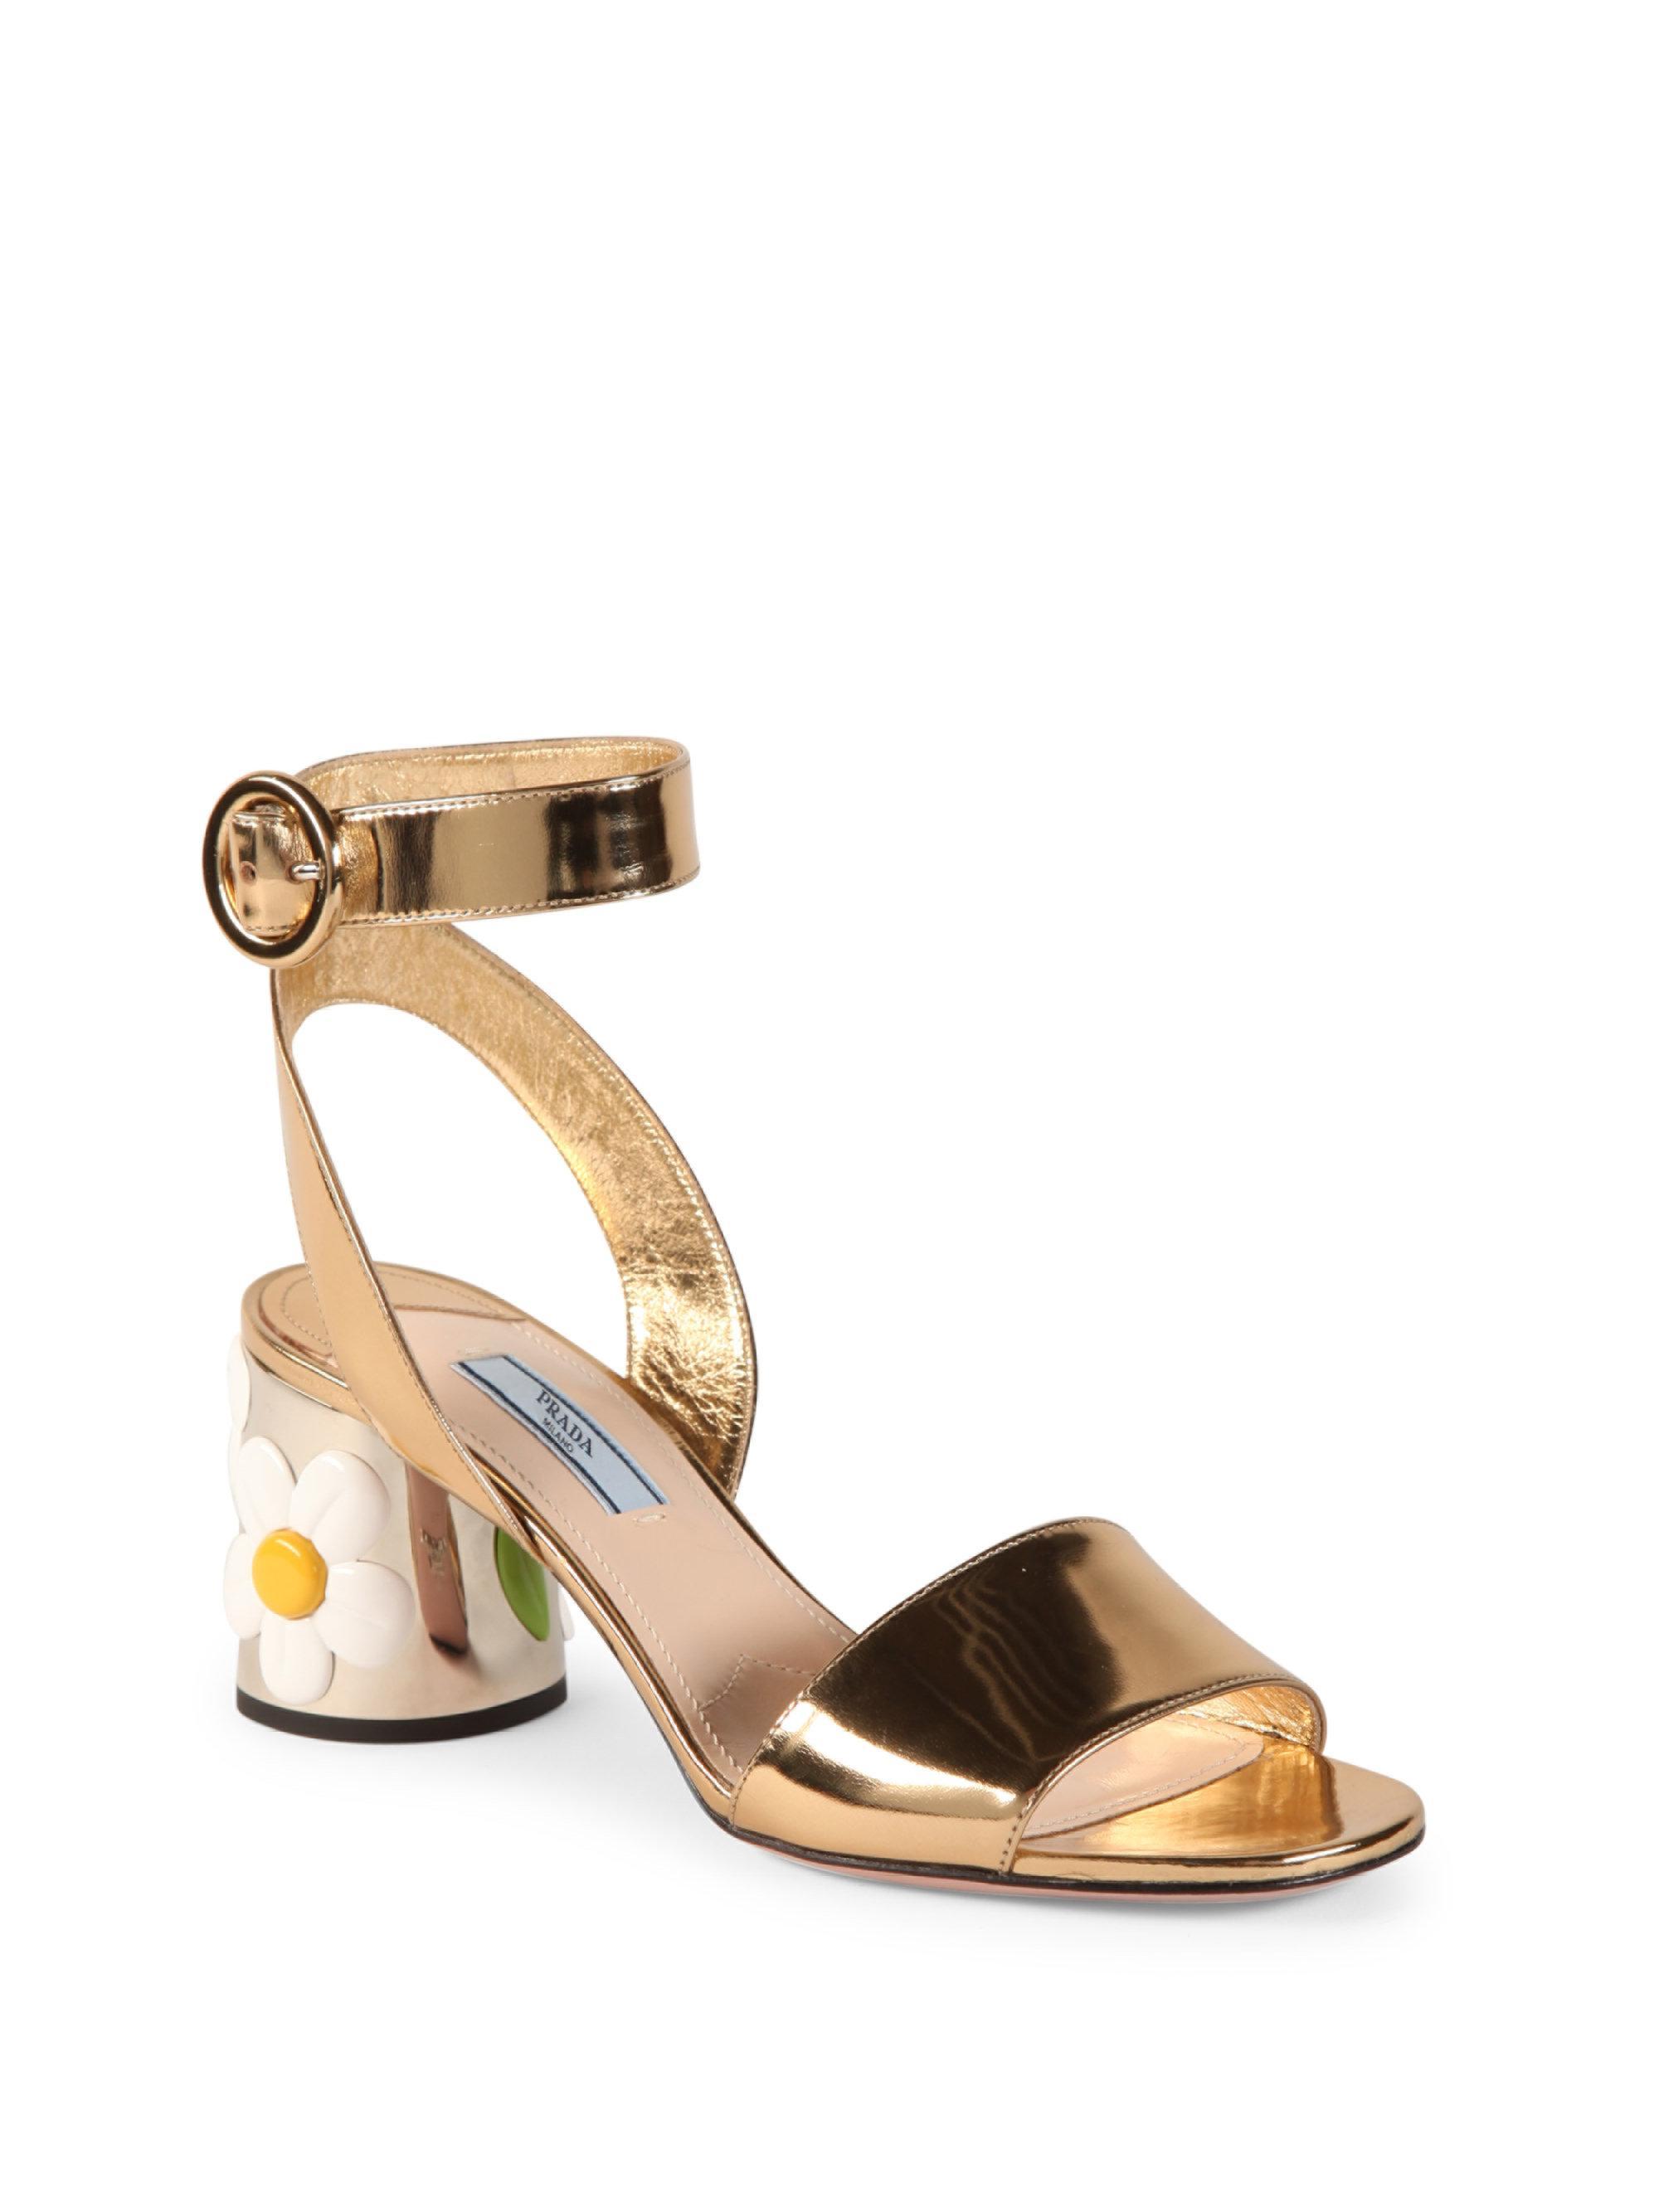 ade638120bbb Lyst - Prada Flower-heel Metallic Leather Ankle-strap Sandals in ...